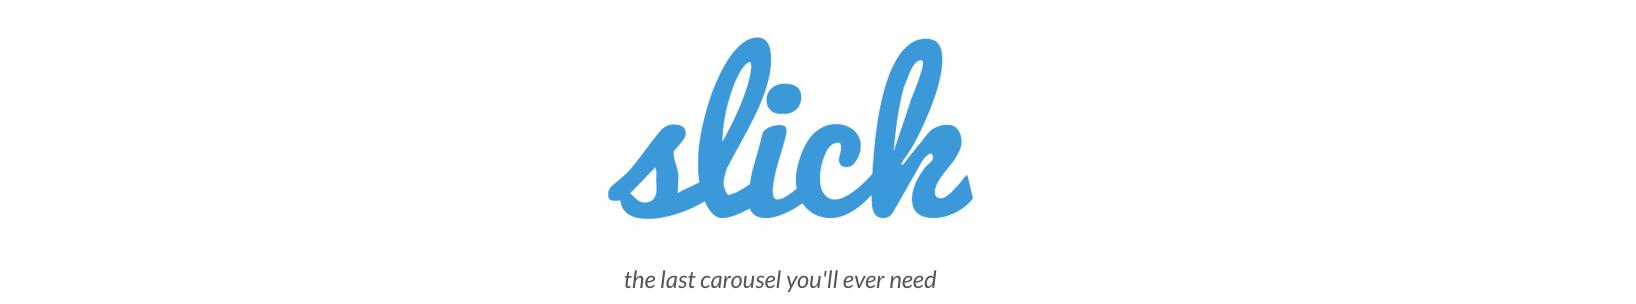 Magento 2 content slider - Slick carousel